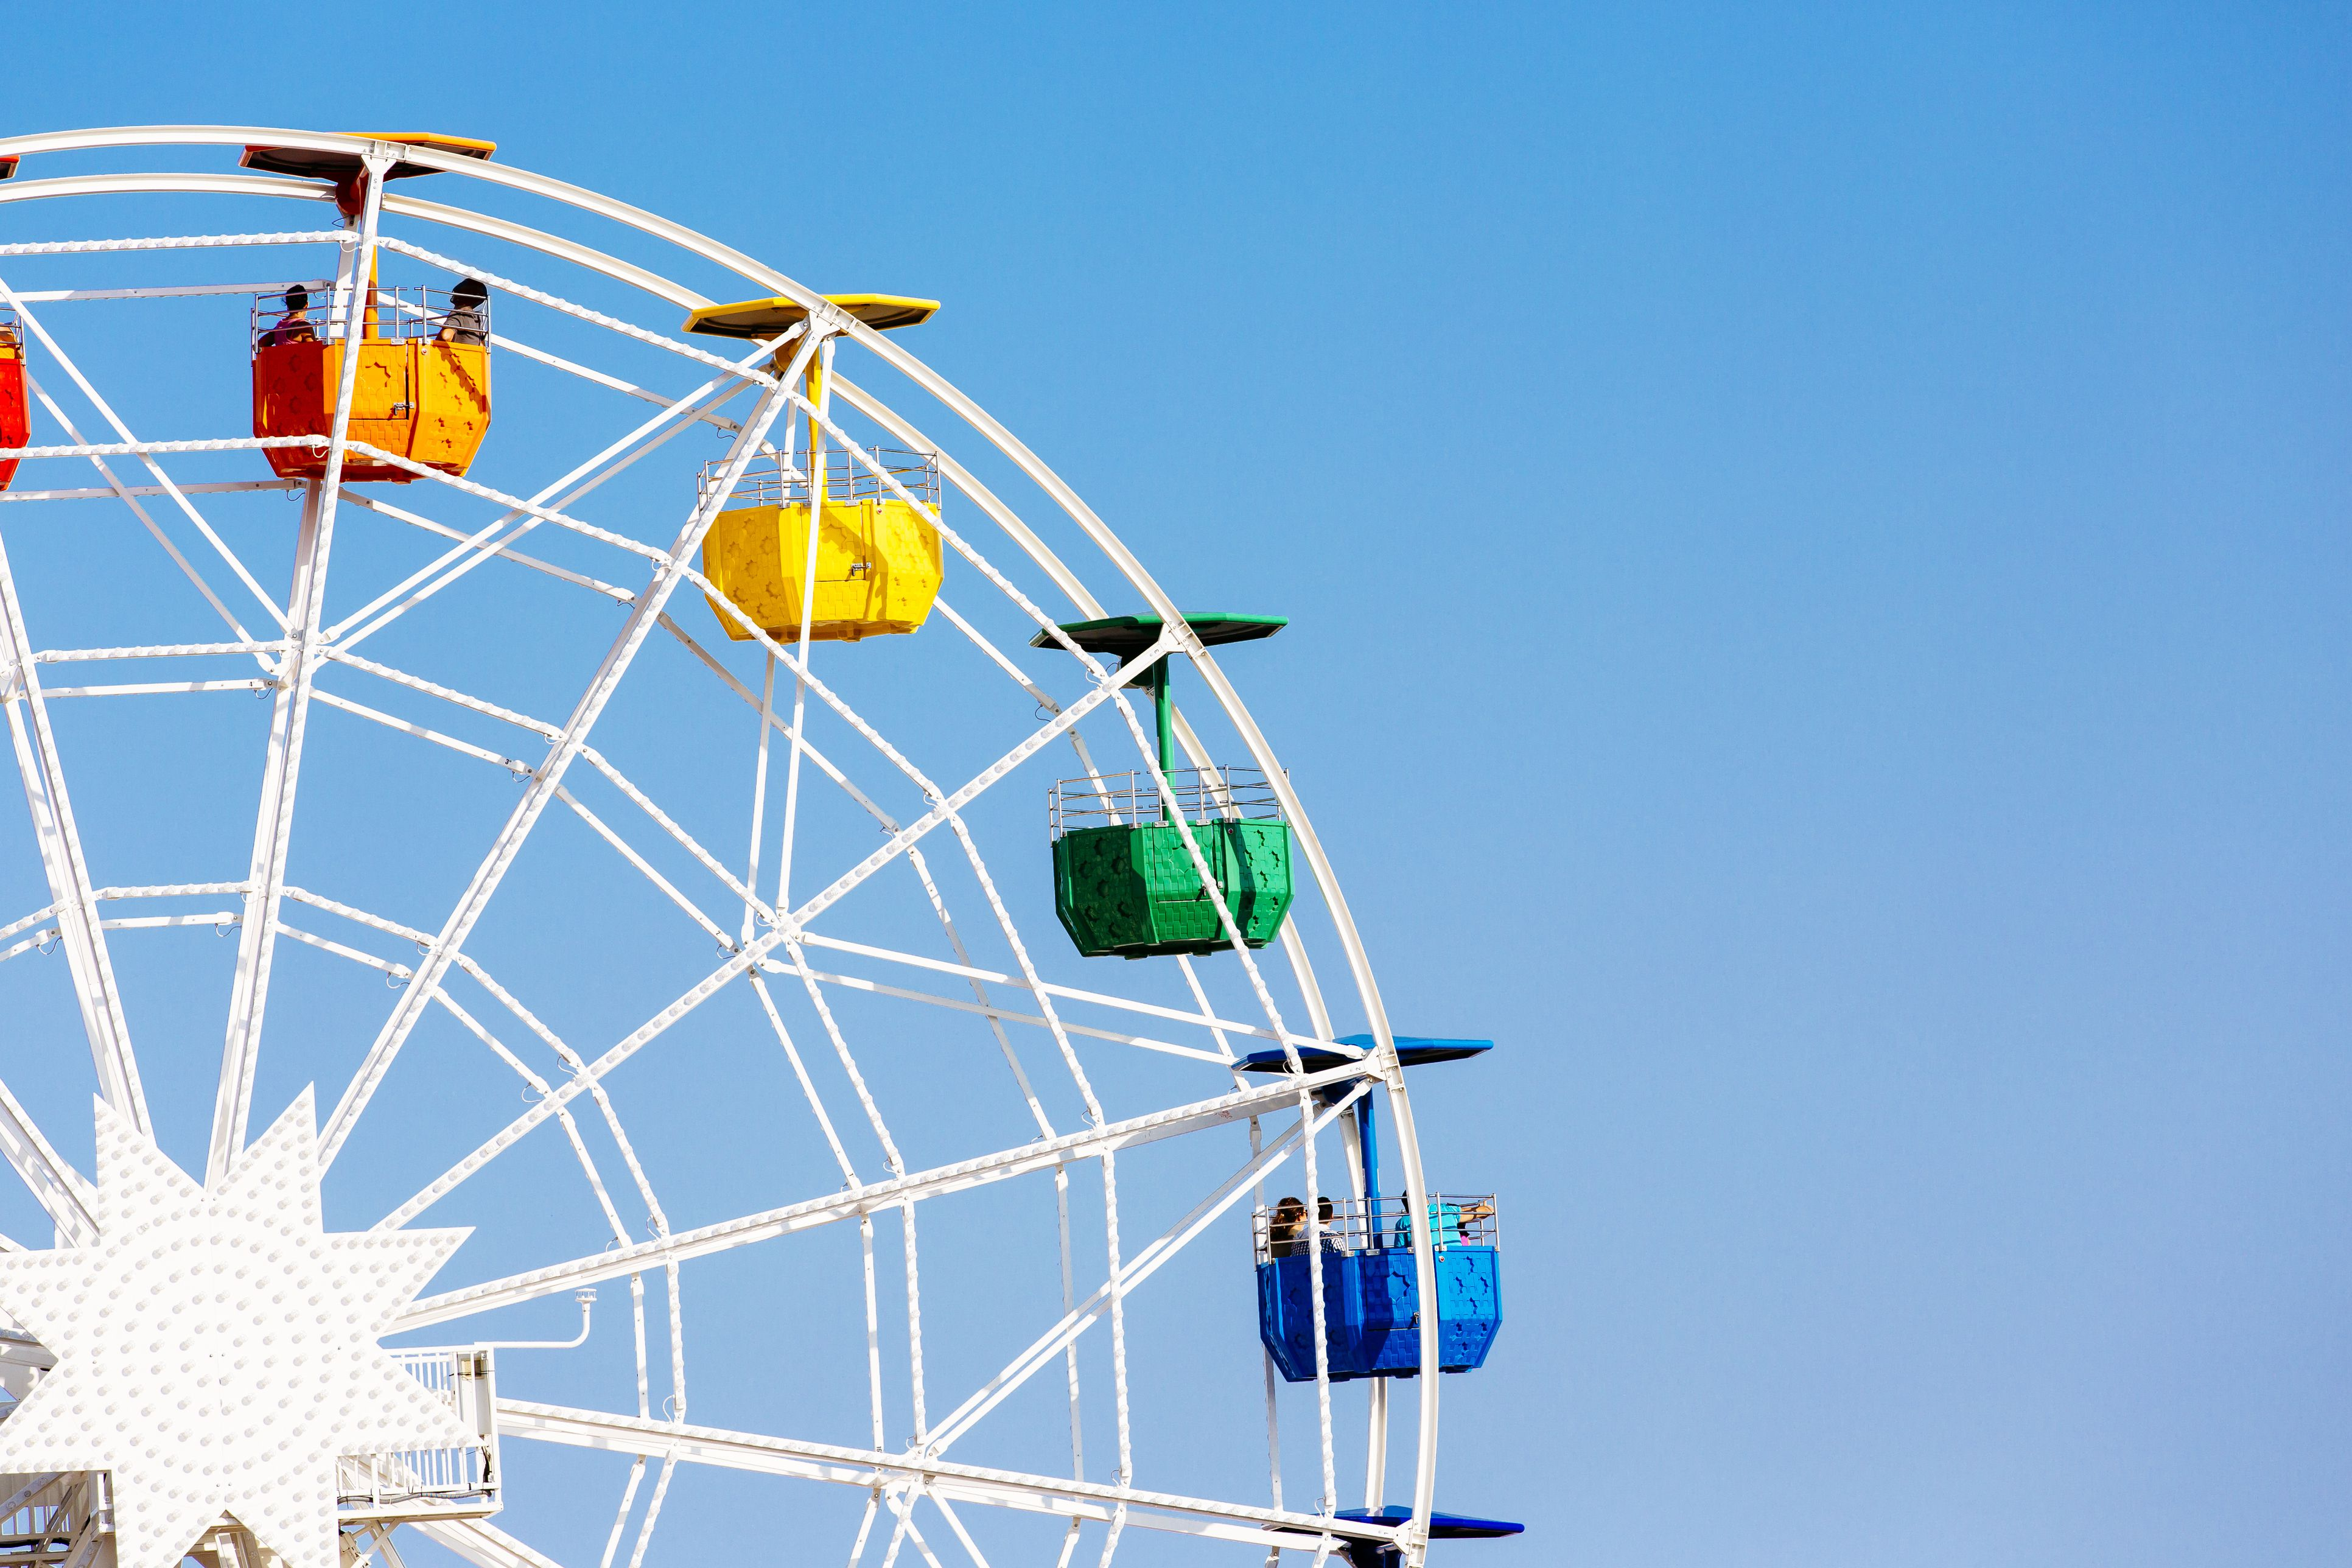 Colorful ferris wheel against clear blue sky